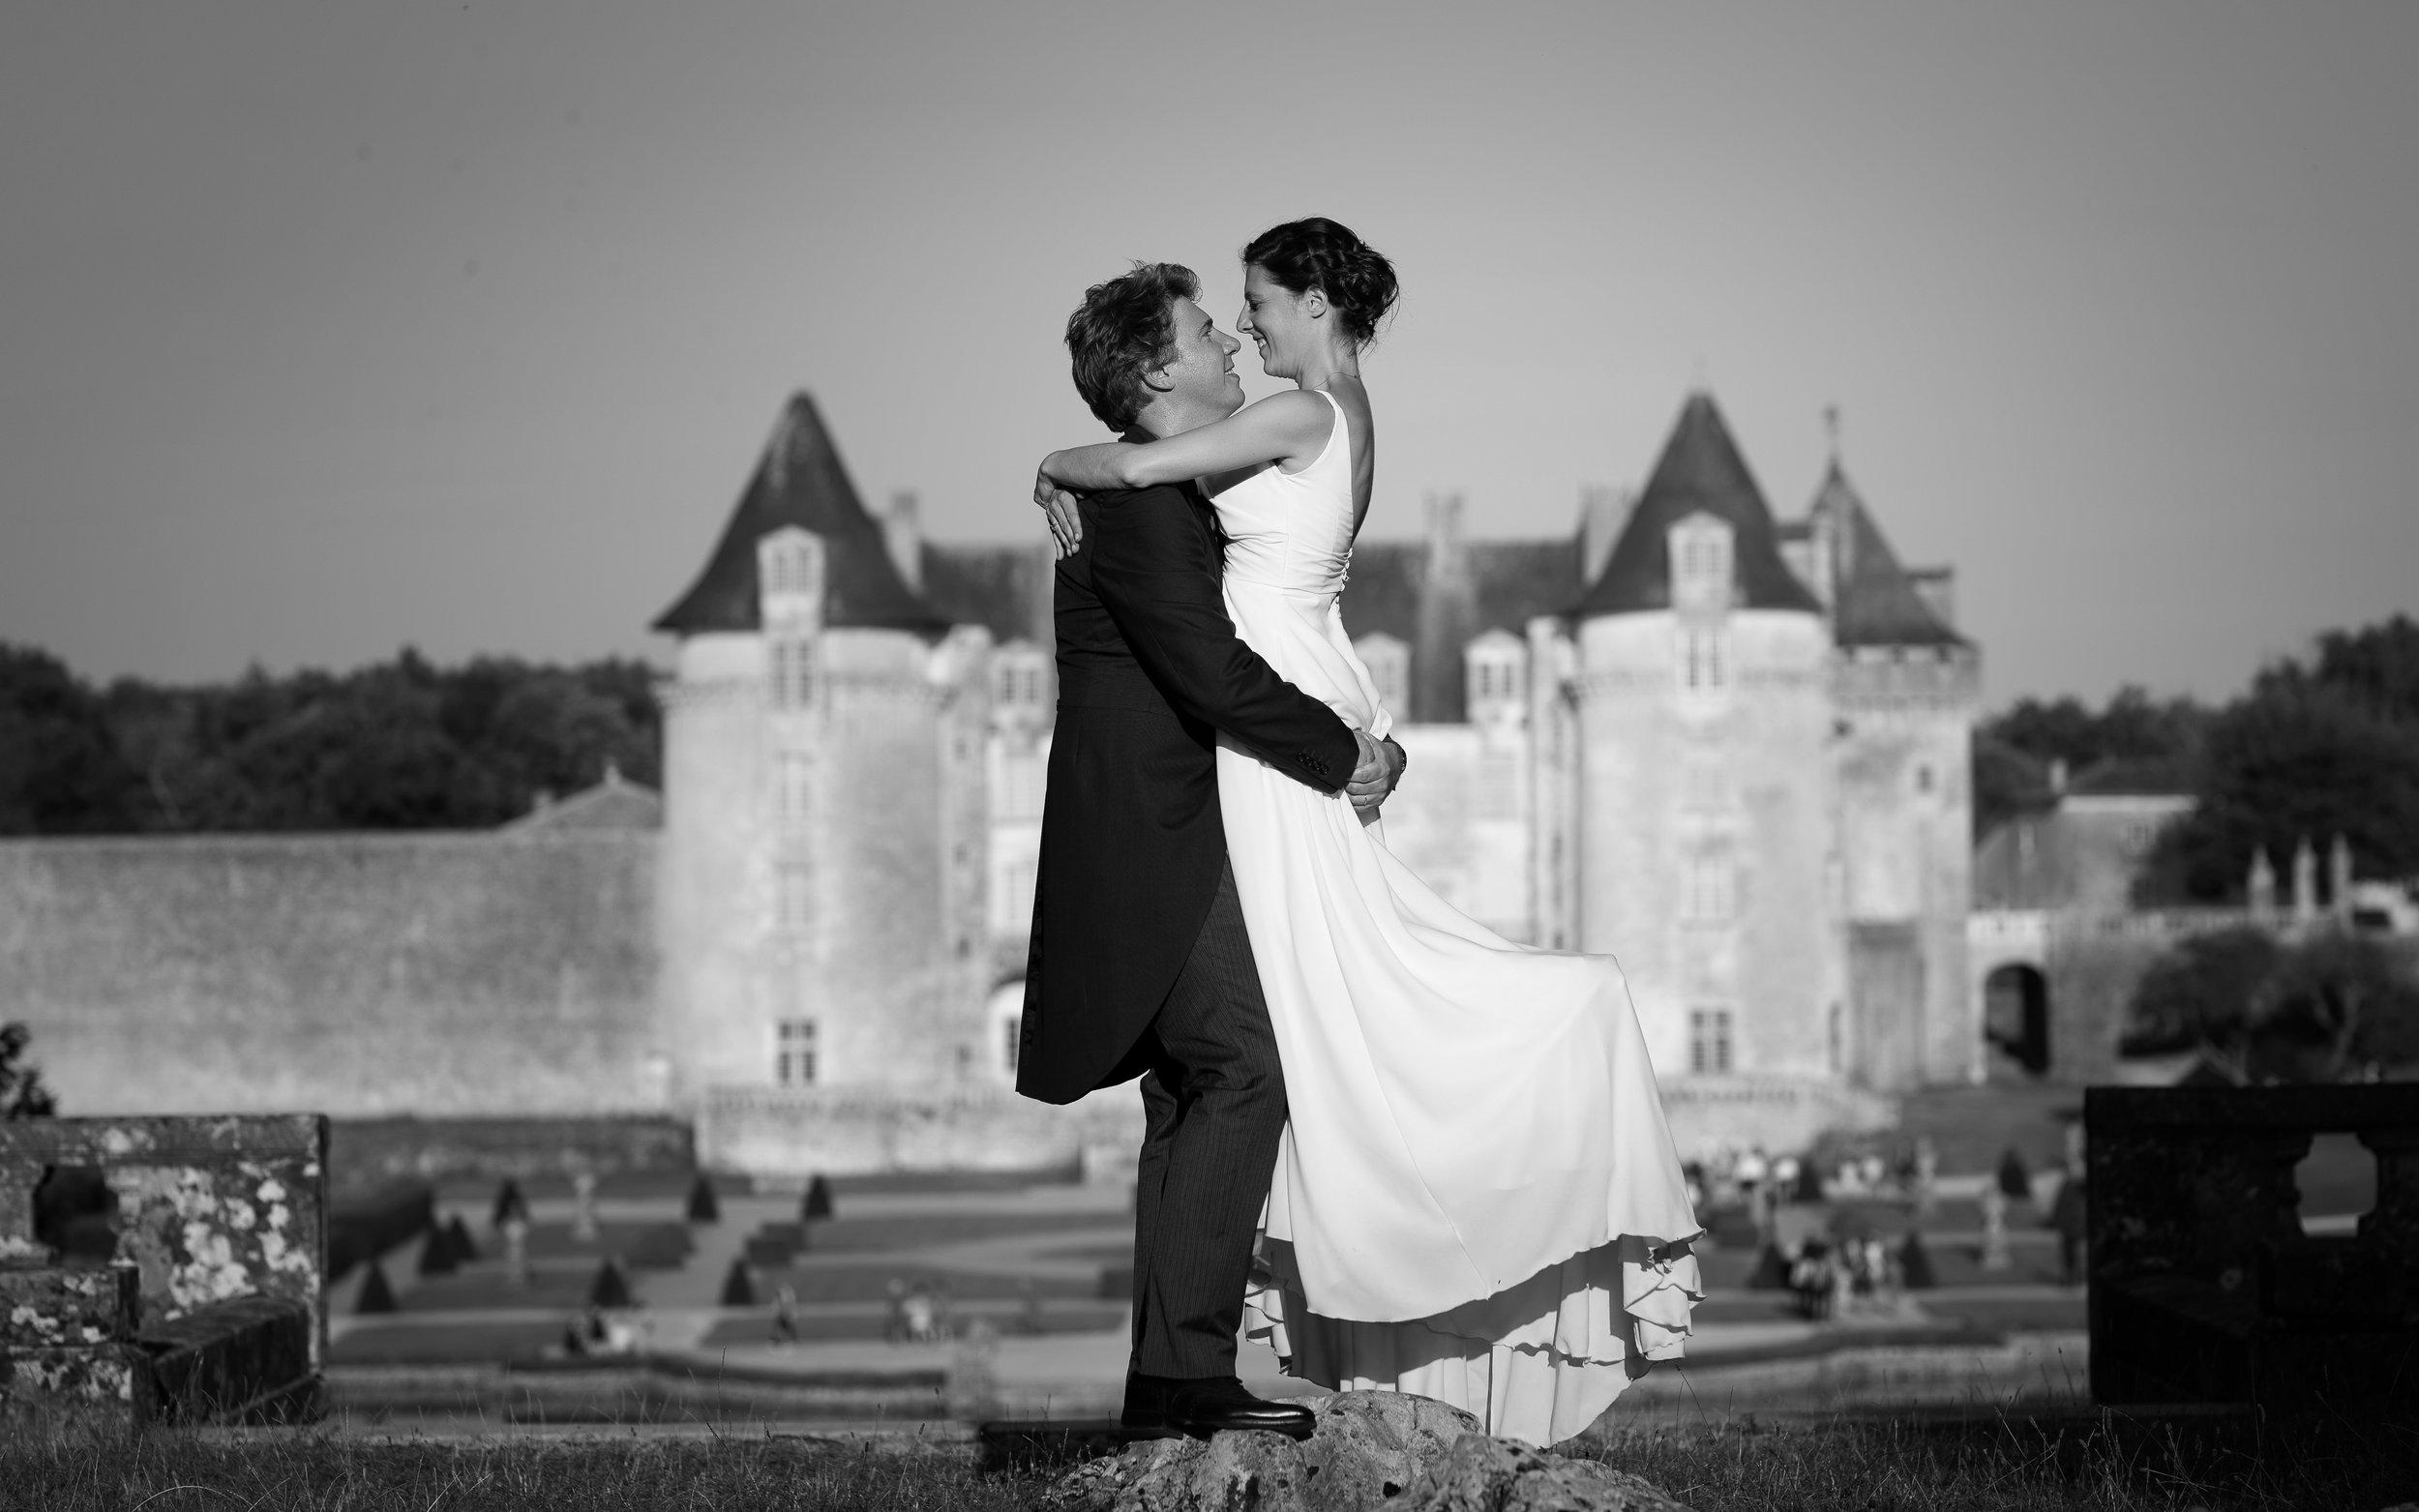 photographe-mariage-chateau-la-roche-courbon-359.jpg